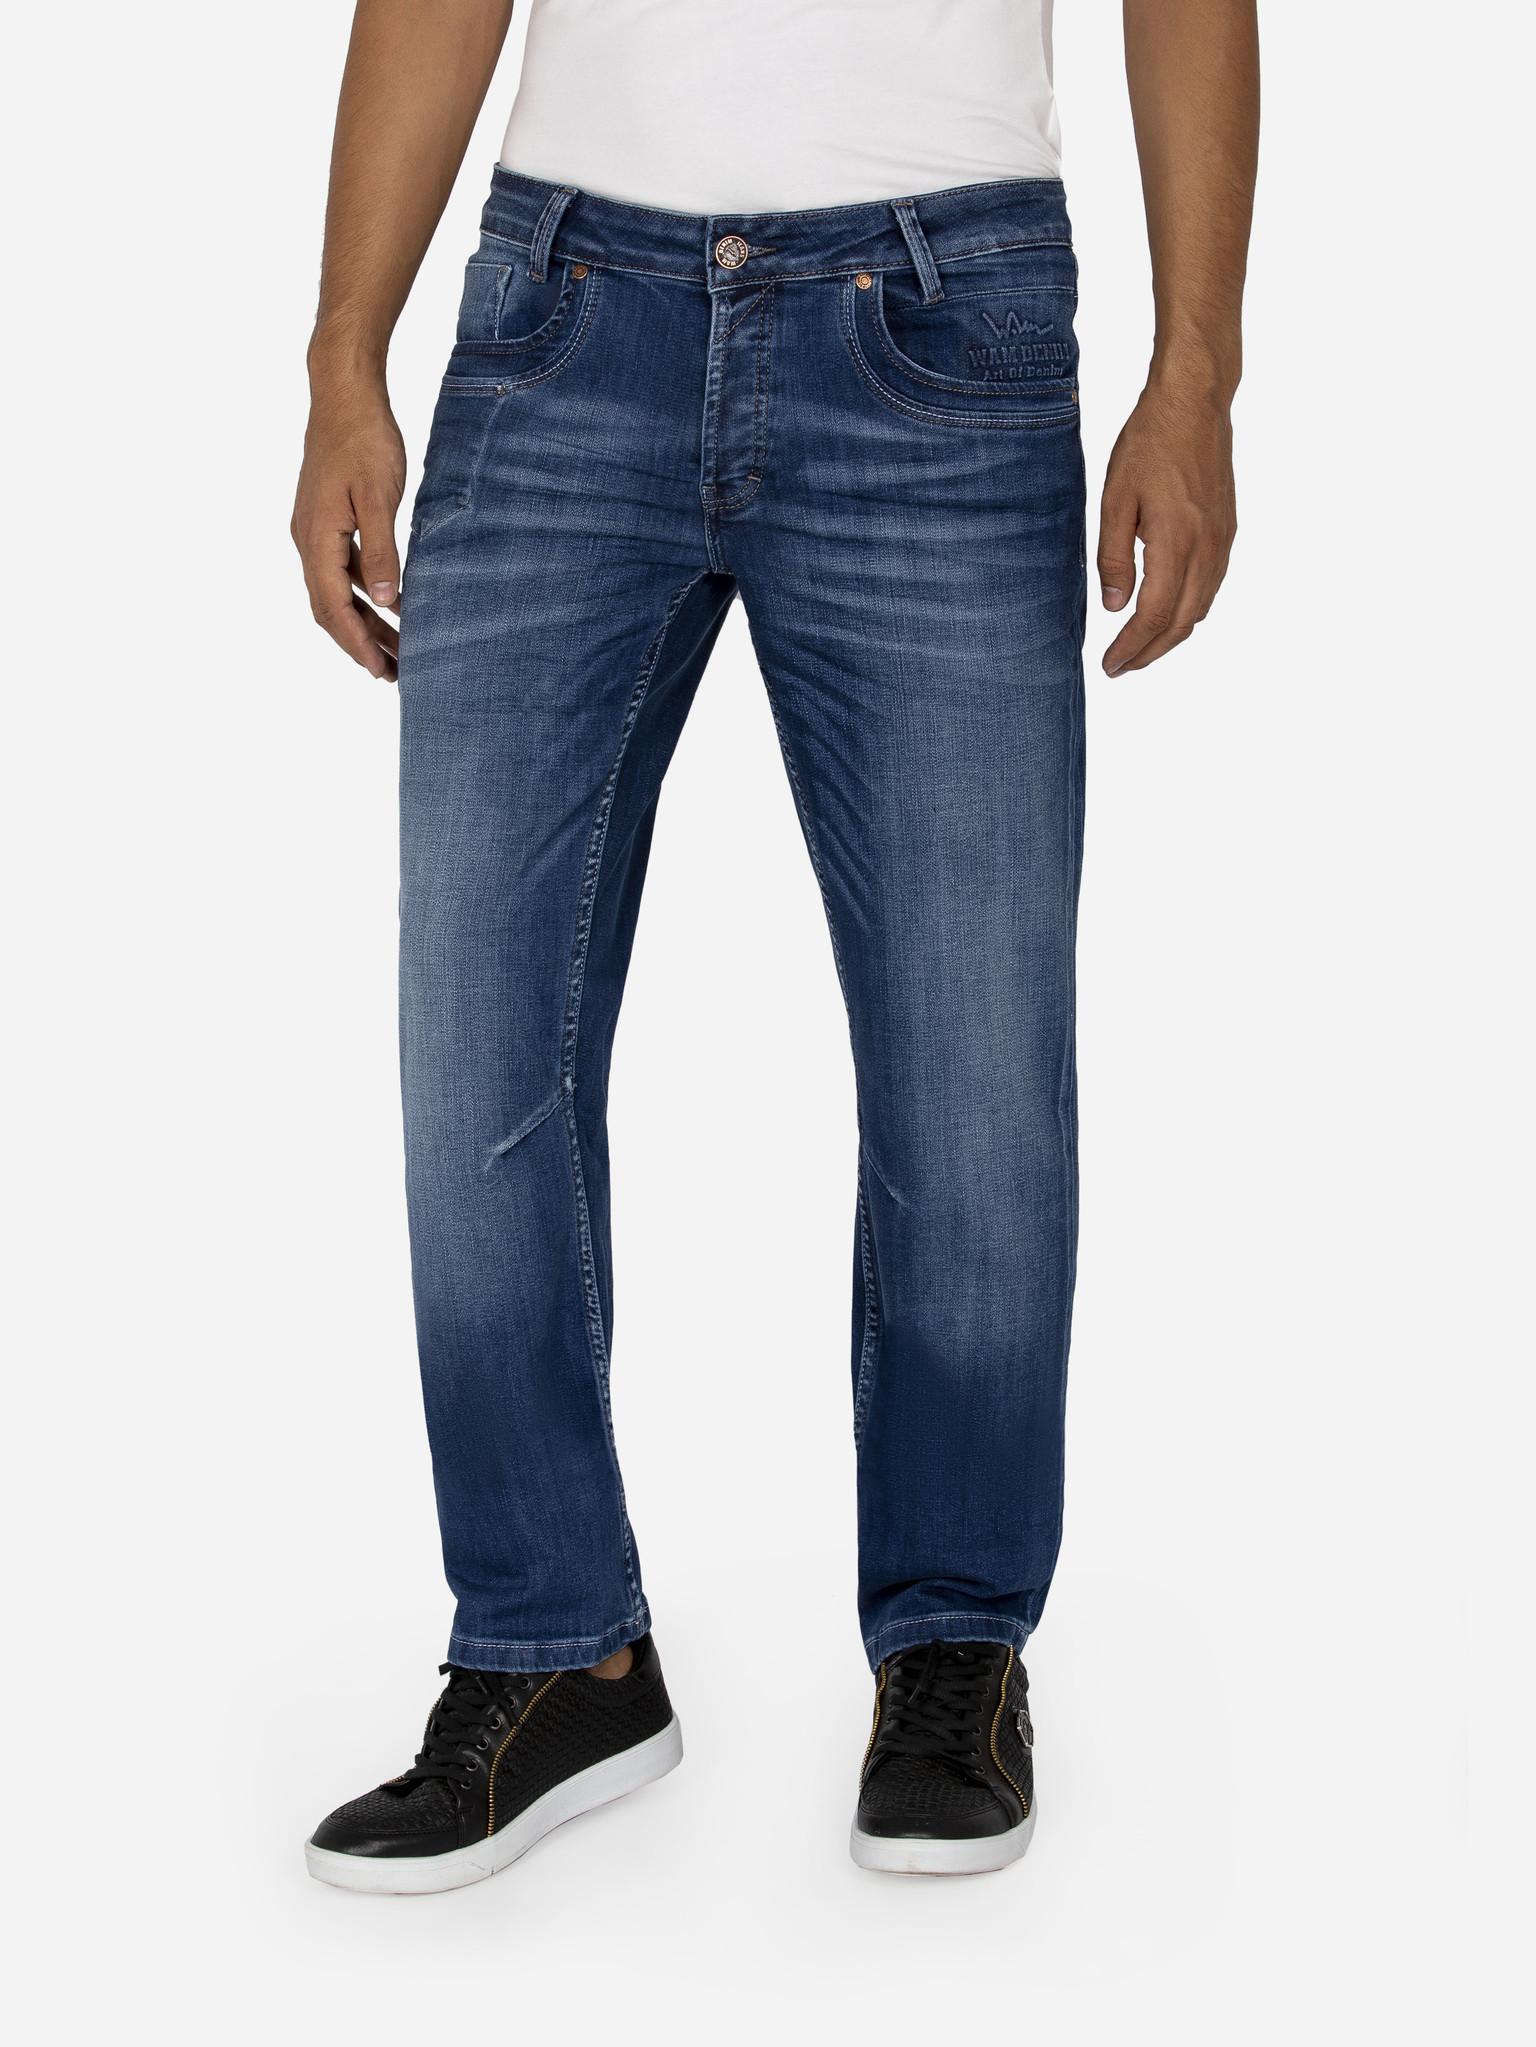 Wam Denim Jeans  Maat: 32/34